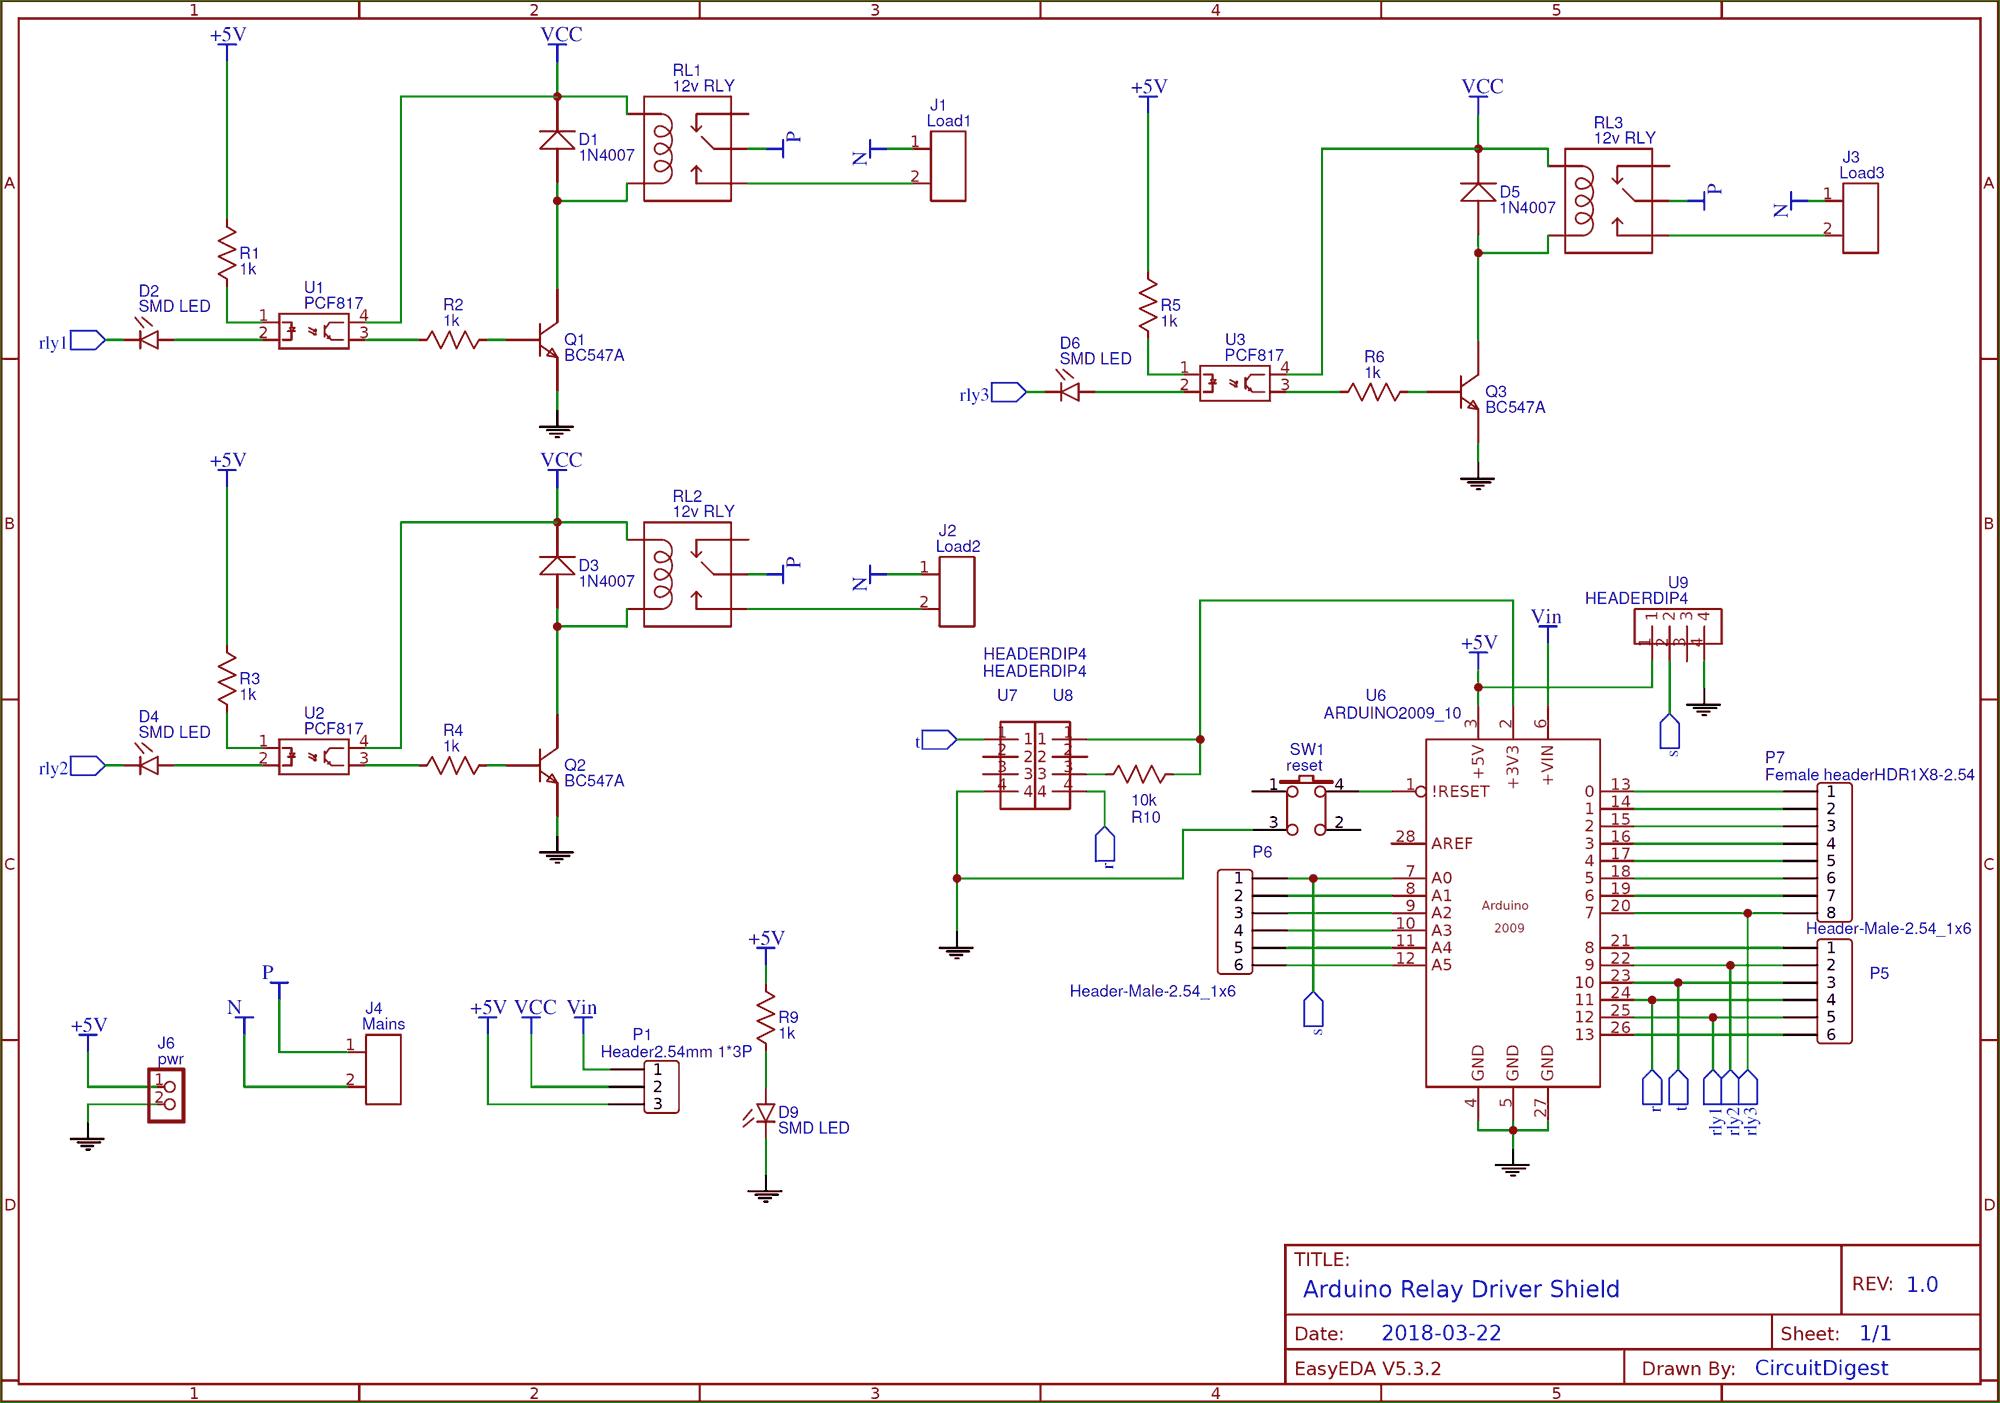 circuit diagram for diy arduino relay driver shield pcb [ 2000 x 1403 Pixel ]